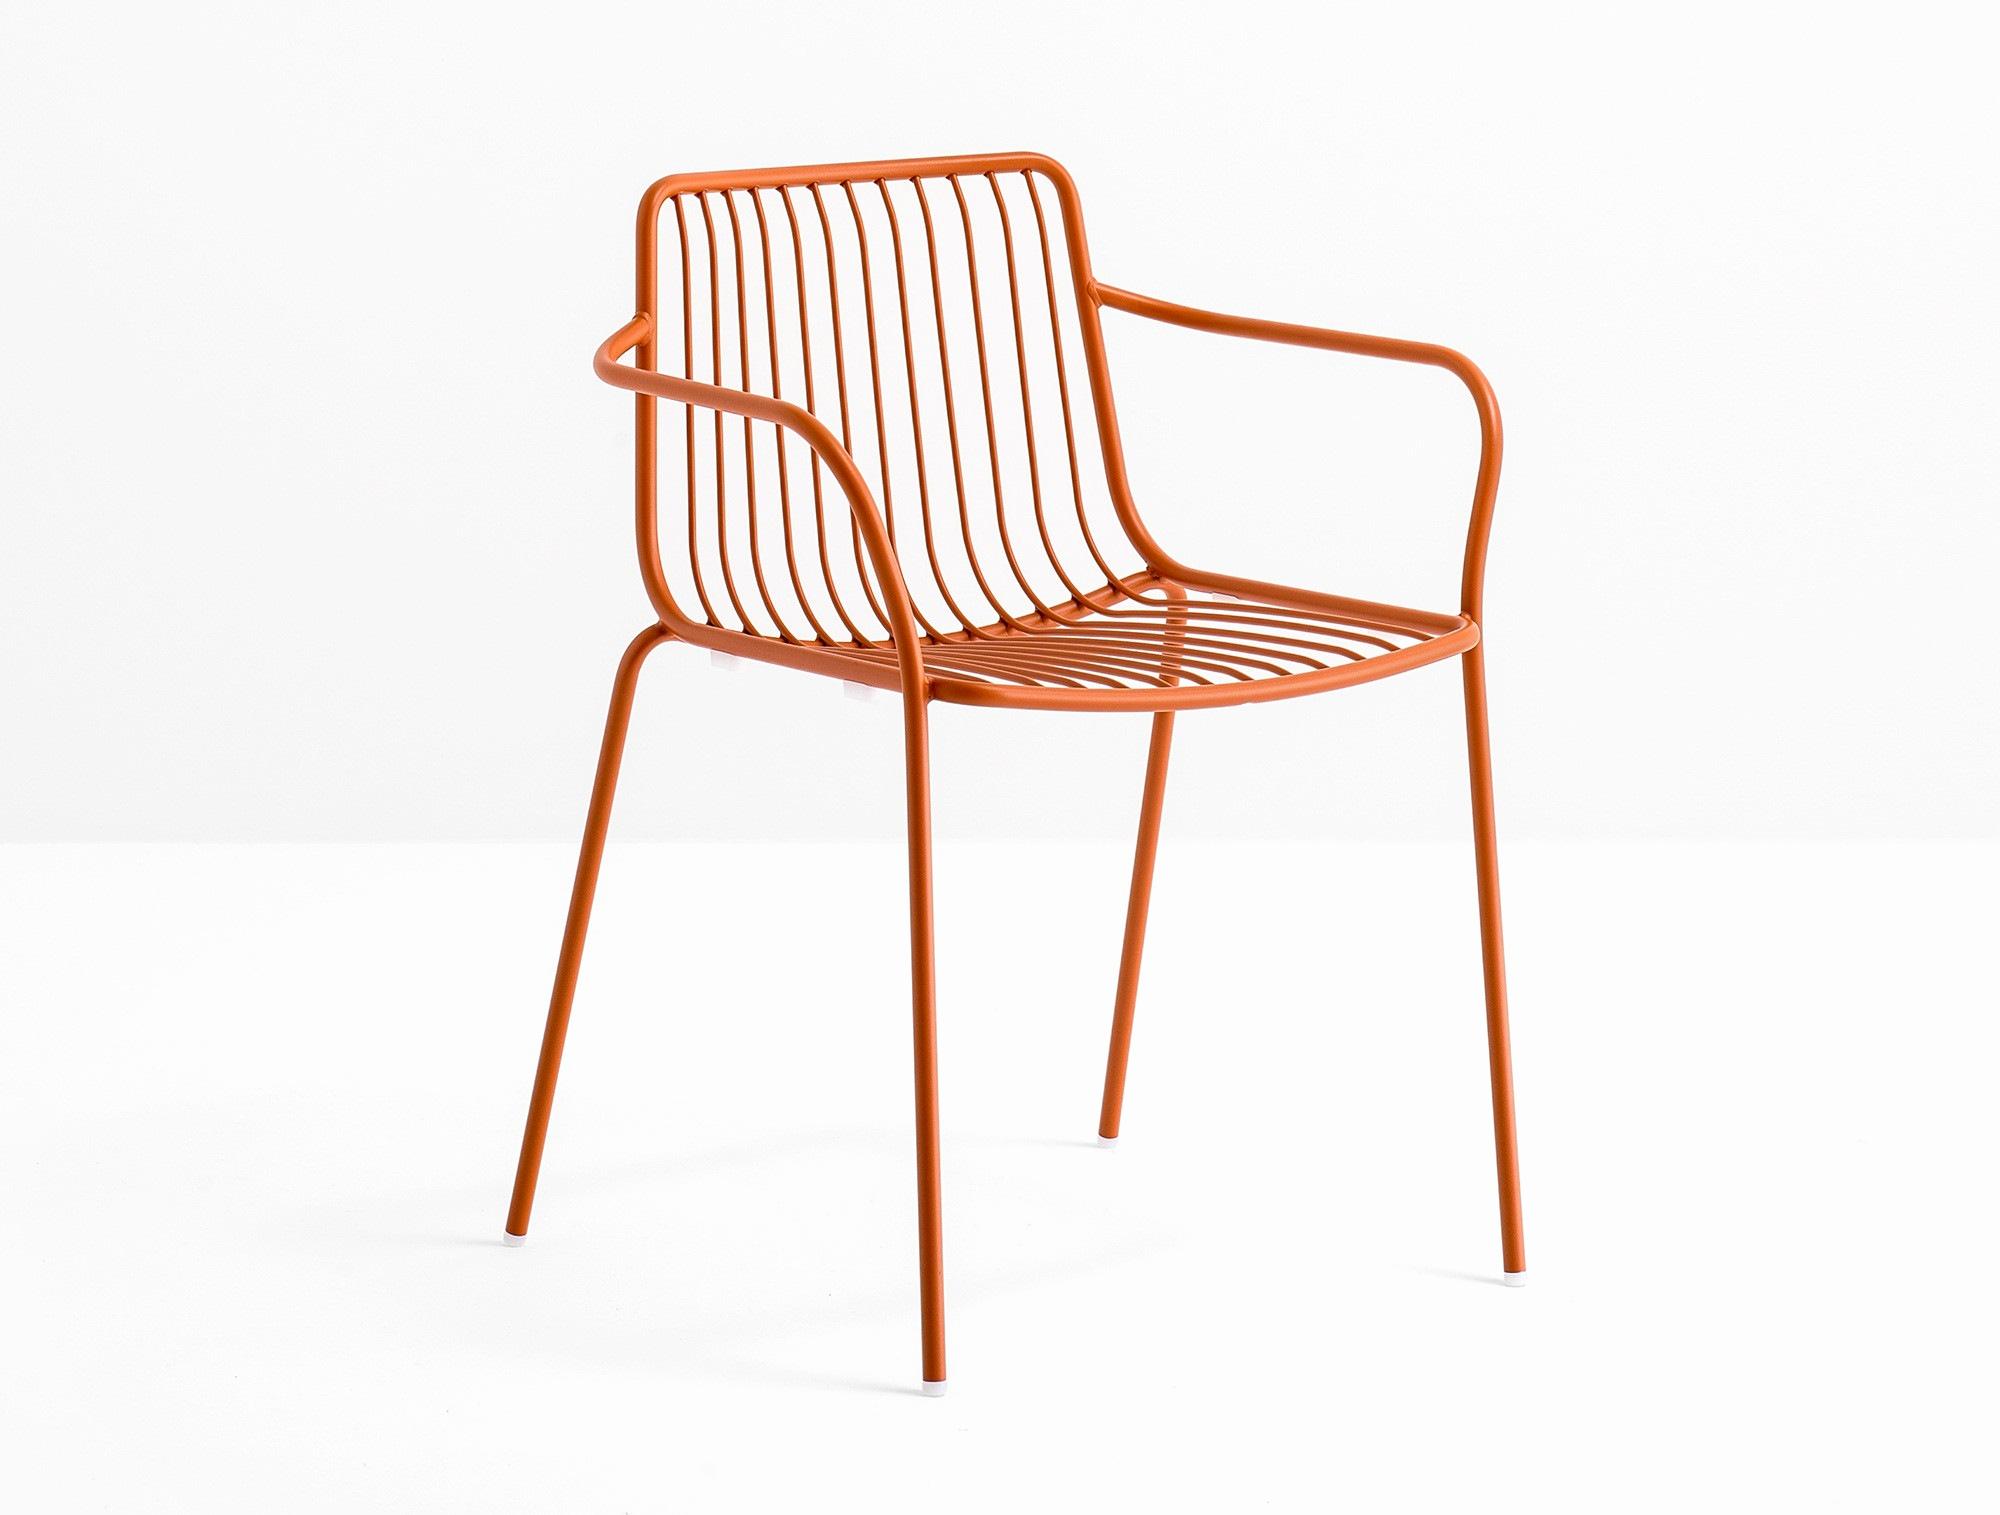 transat jardin pliable beau chaise pliante de jardin luxe castorama chaise de jardin s of transat jardin pliable